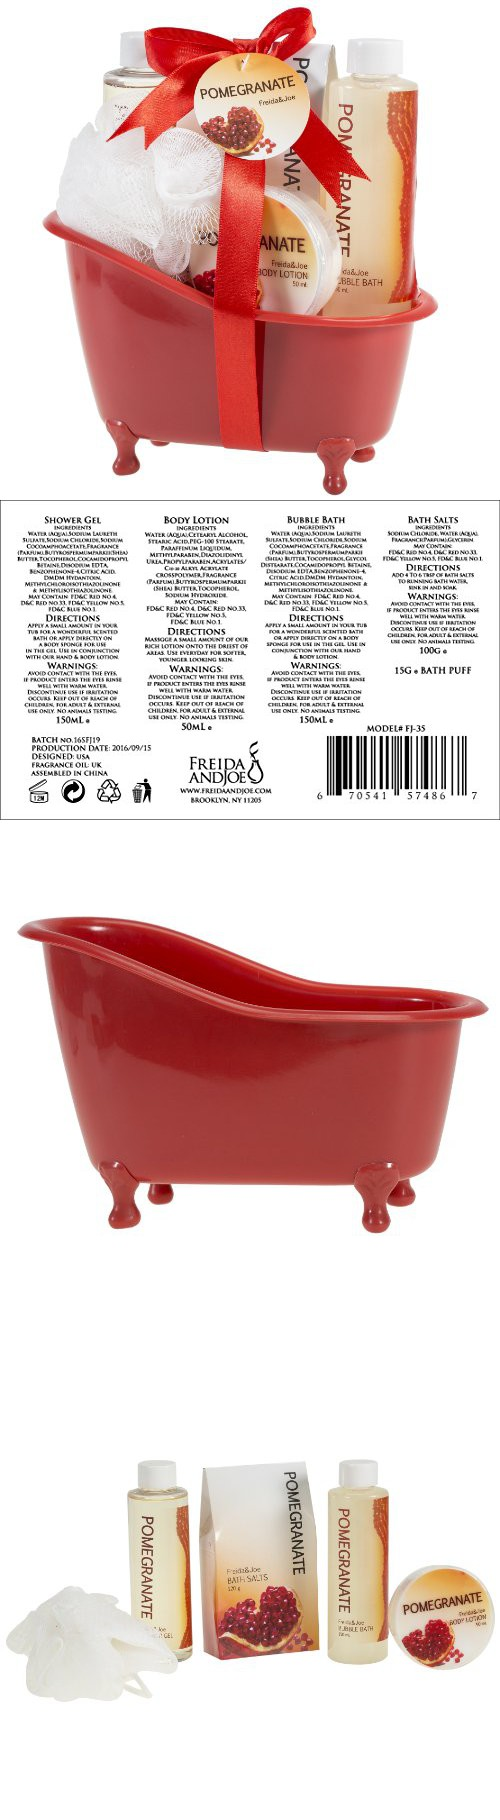 Pomegranate Tub Bath Gift Set Pinterest Products Soap Ampamp Glory Irresistibubble